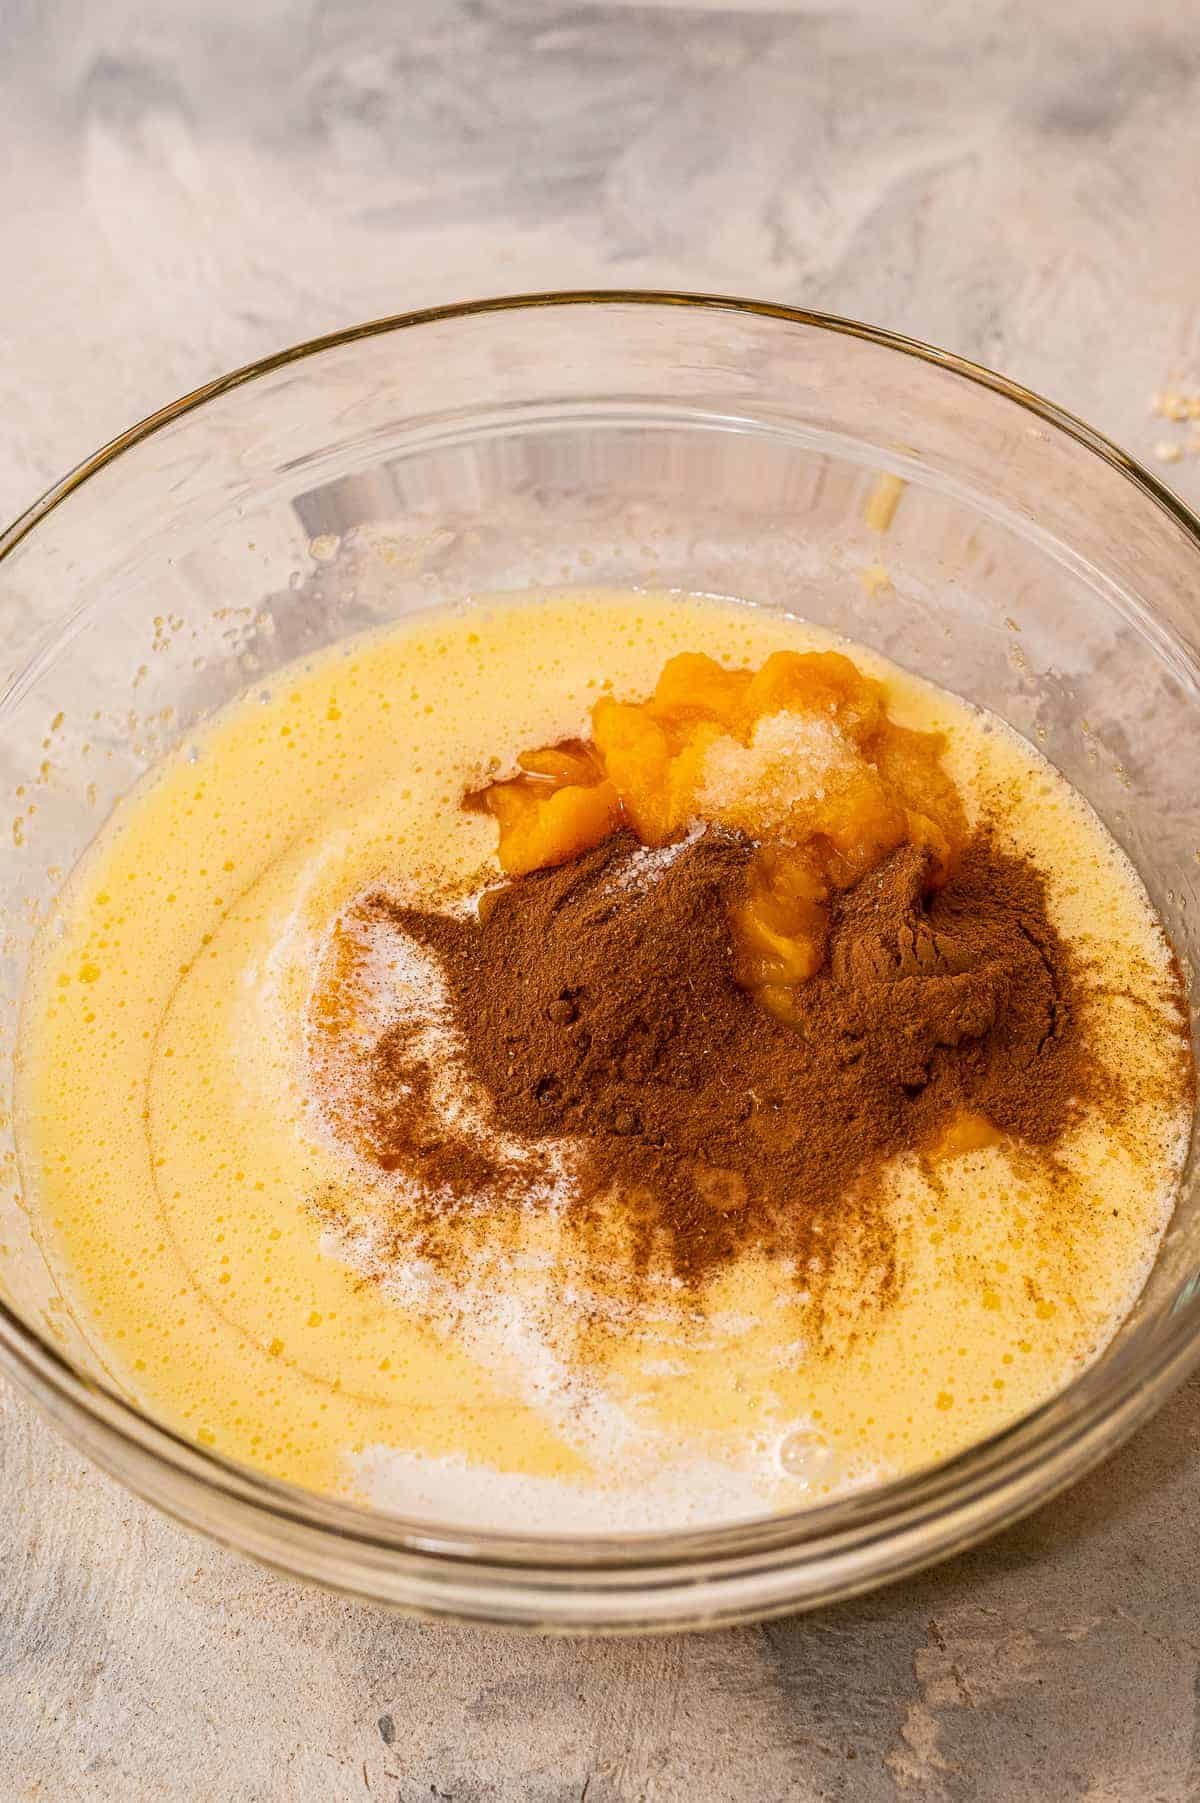 Pumpkin filling for crisp in bowl before mixing